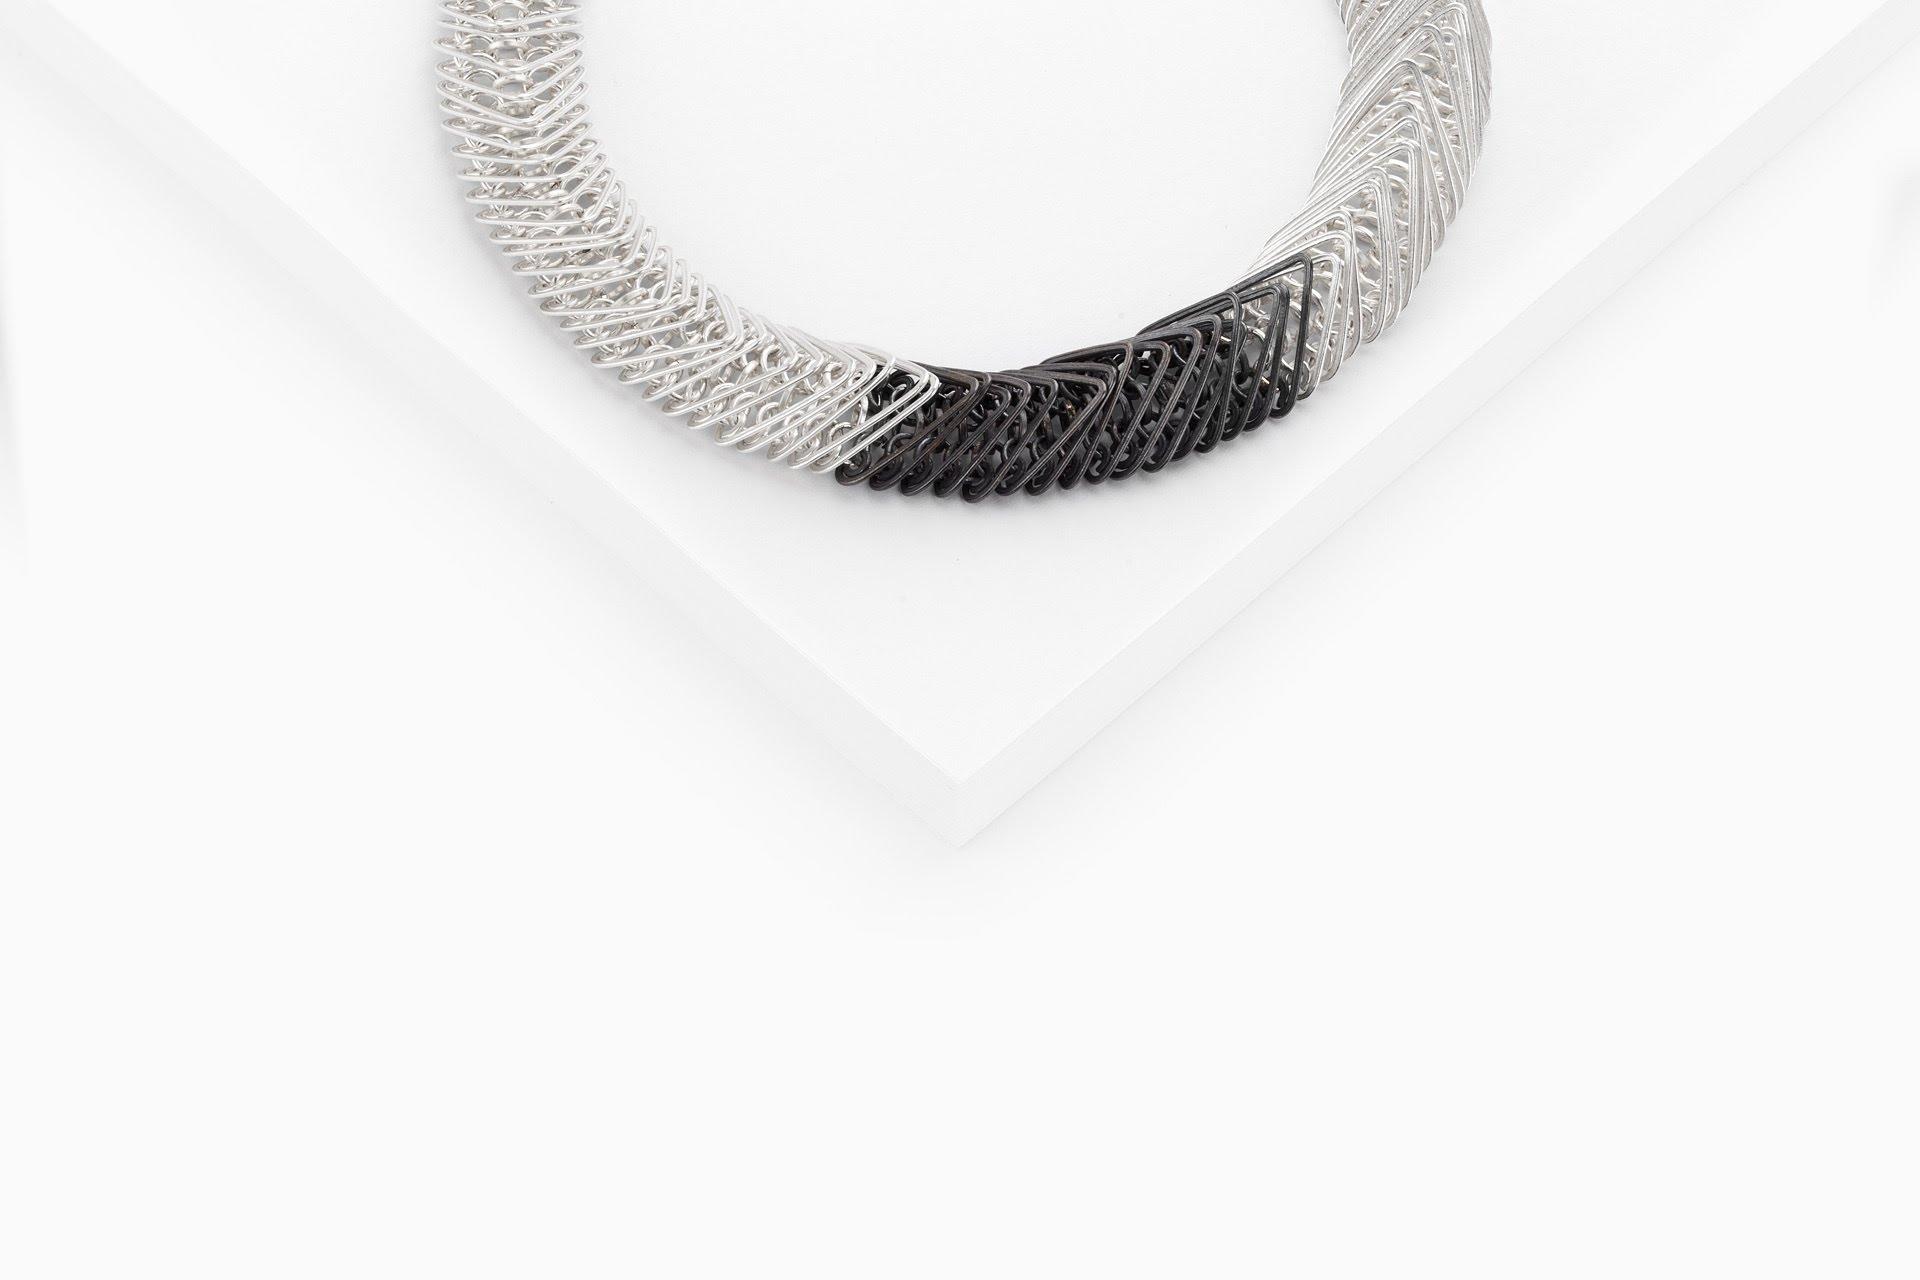 Slinky Necklace_Heather Woof.jpg